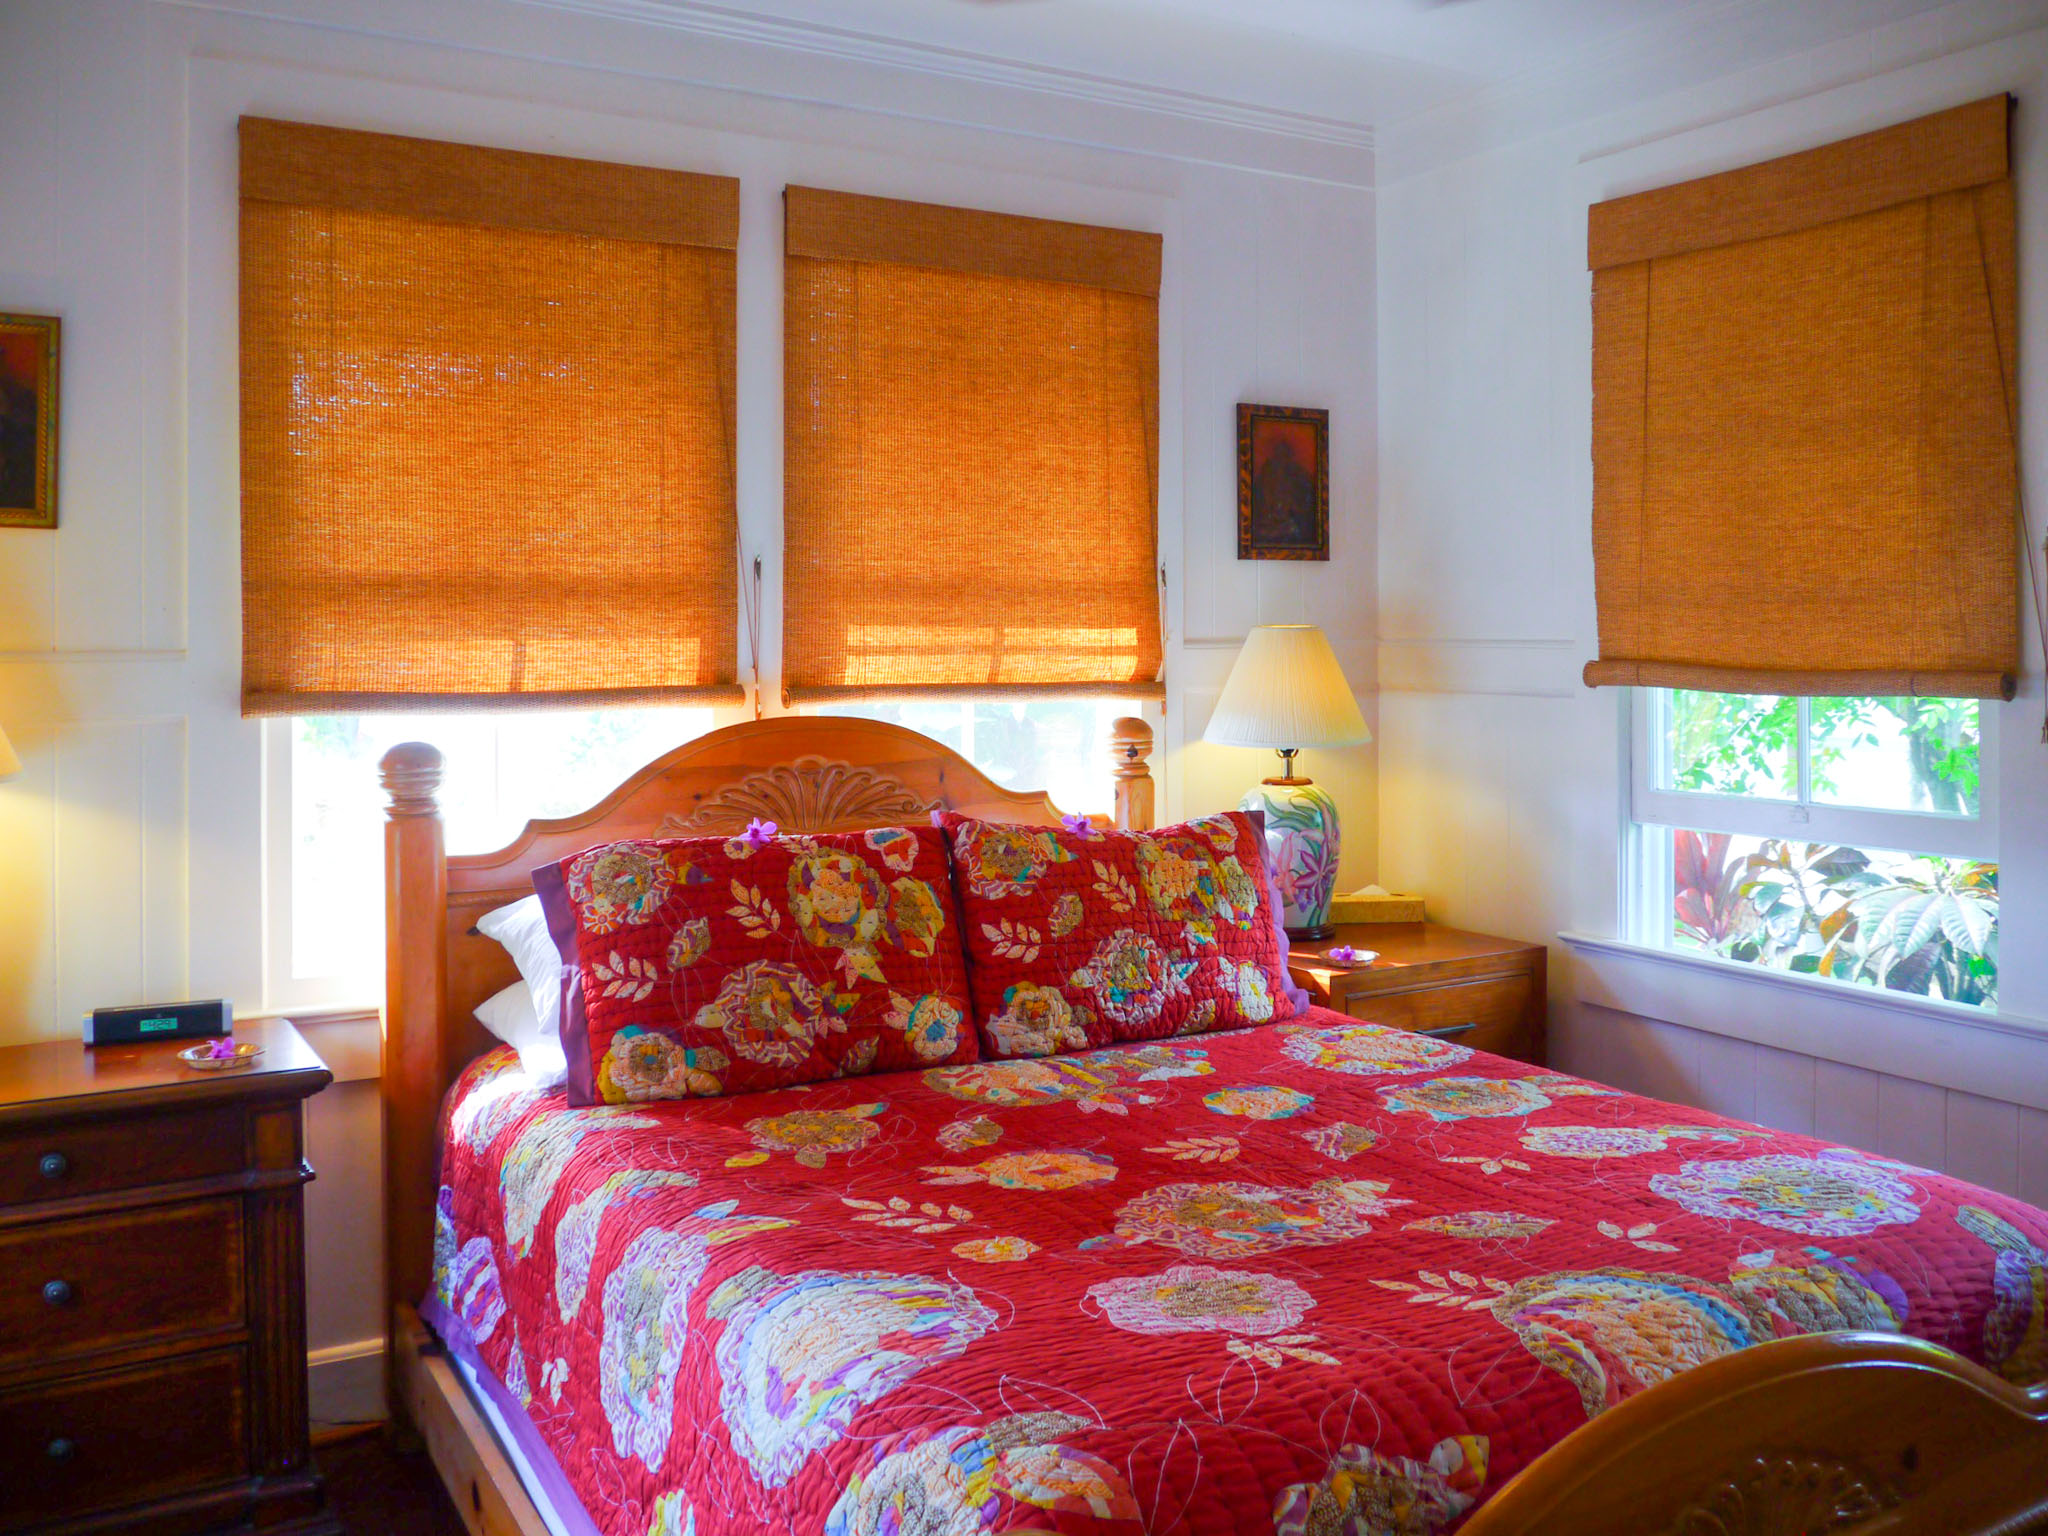 Ohana House bedroom. Fern Grotto Inn. Photo by Johanna Read TravelEater.net